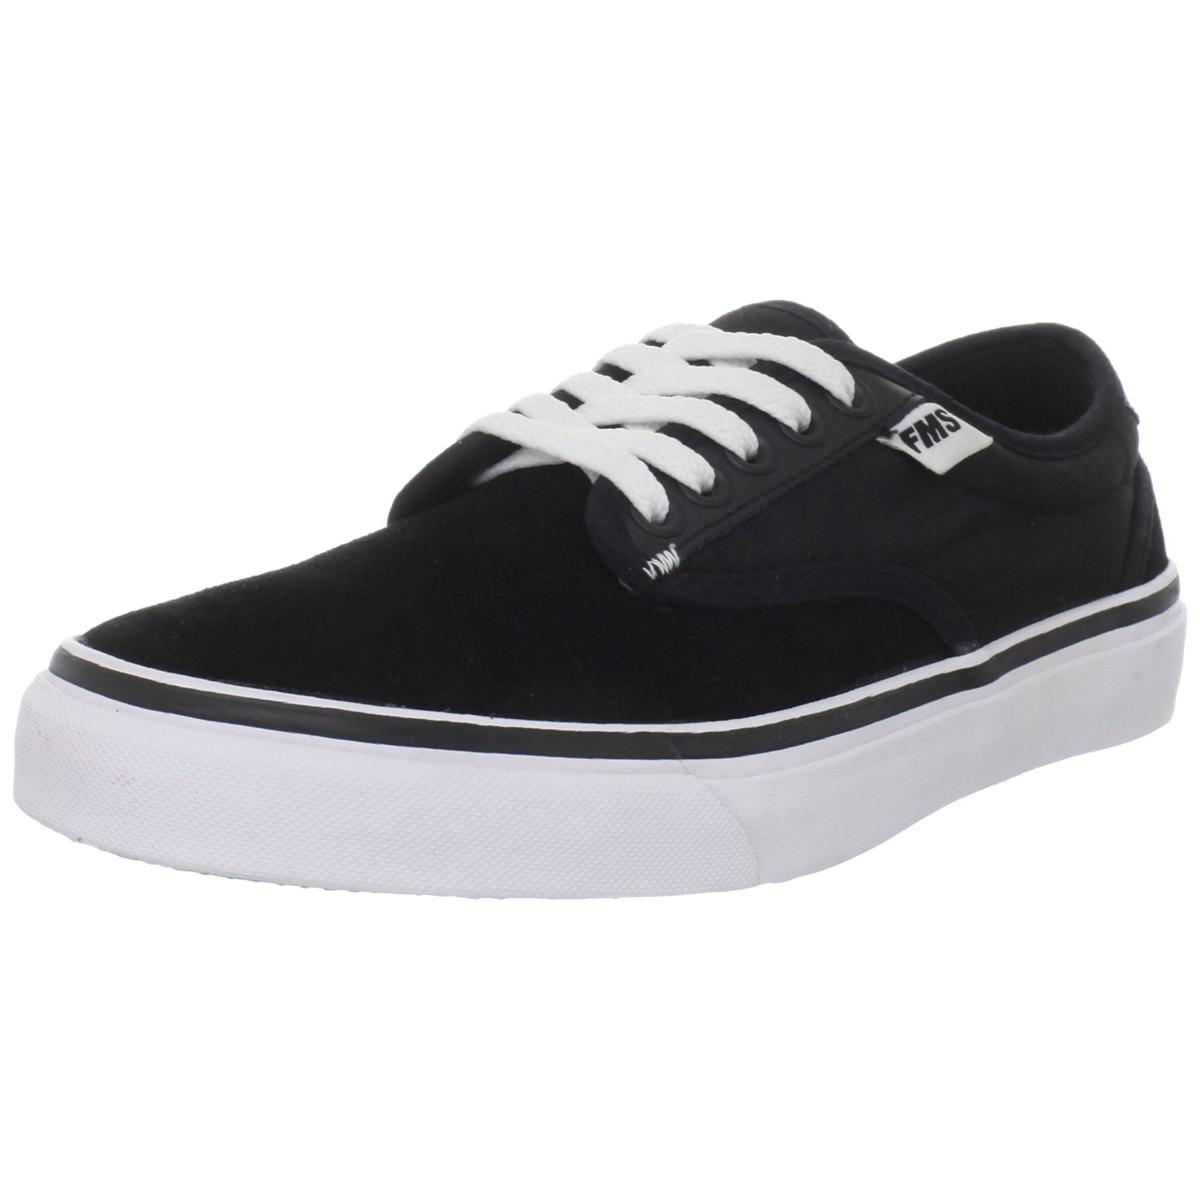 Fms Endo Mens Black//White Sneakers